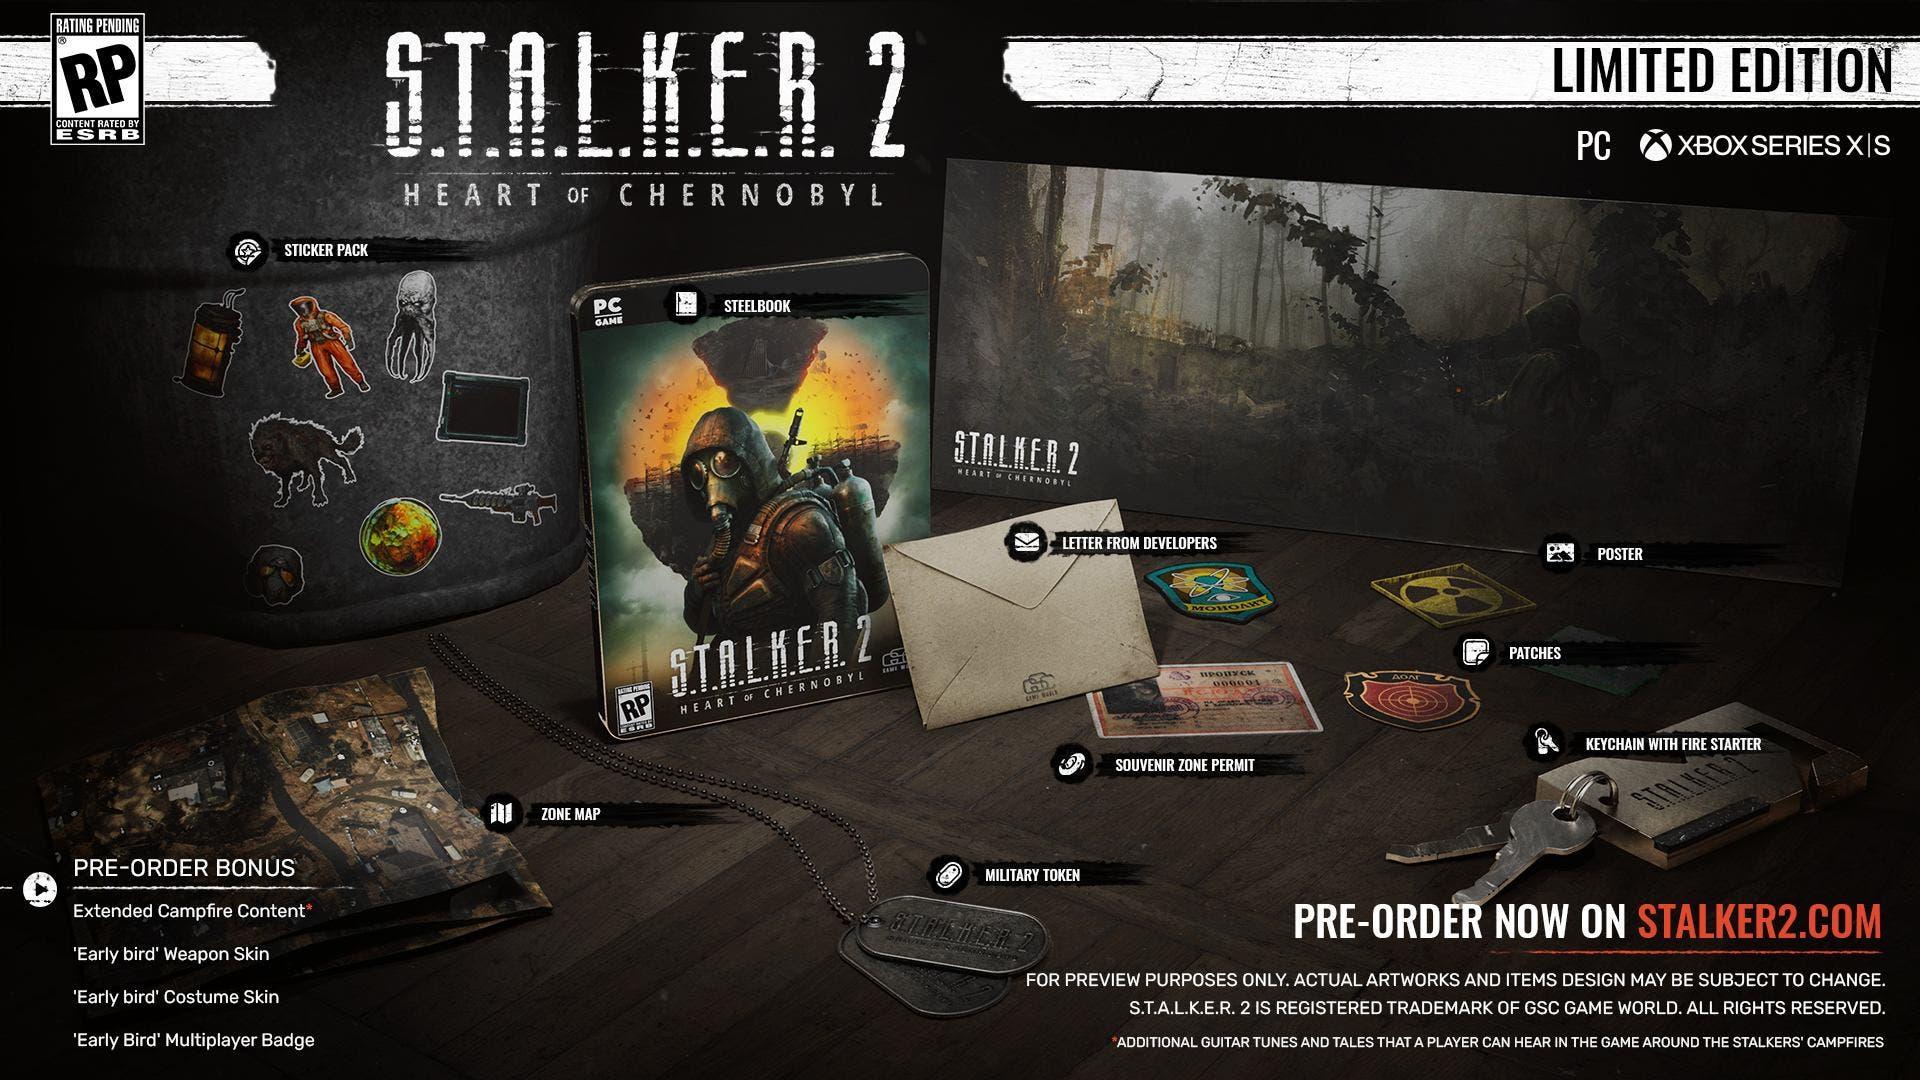 edición coleccionista de S.T.A.L.K.E.R. 2 Heart of Chernobyl